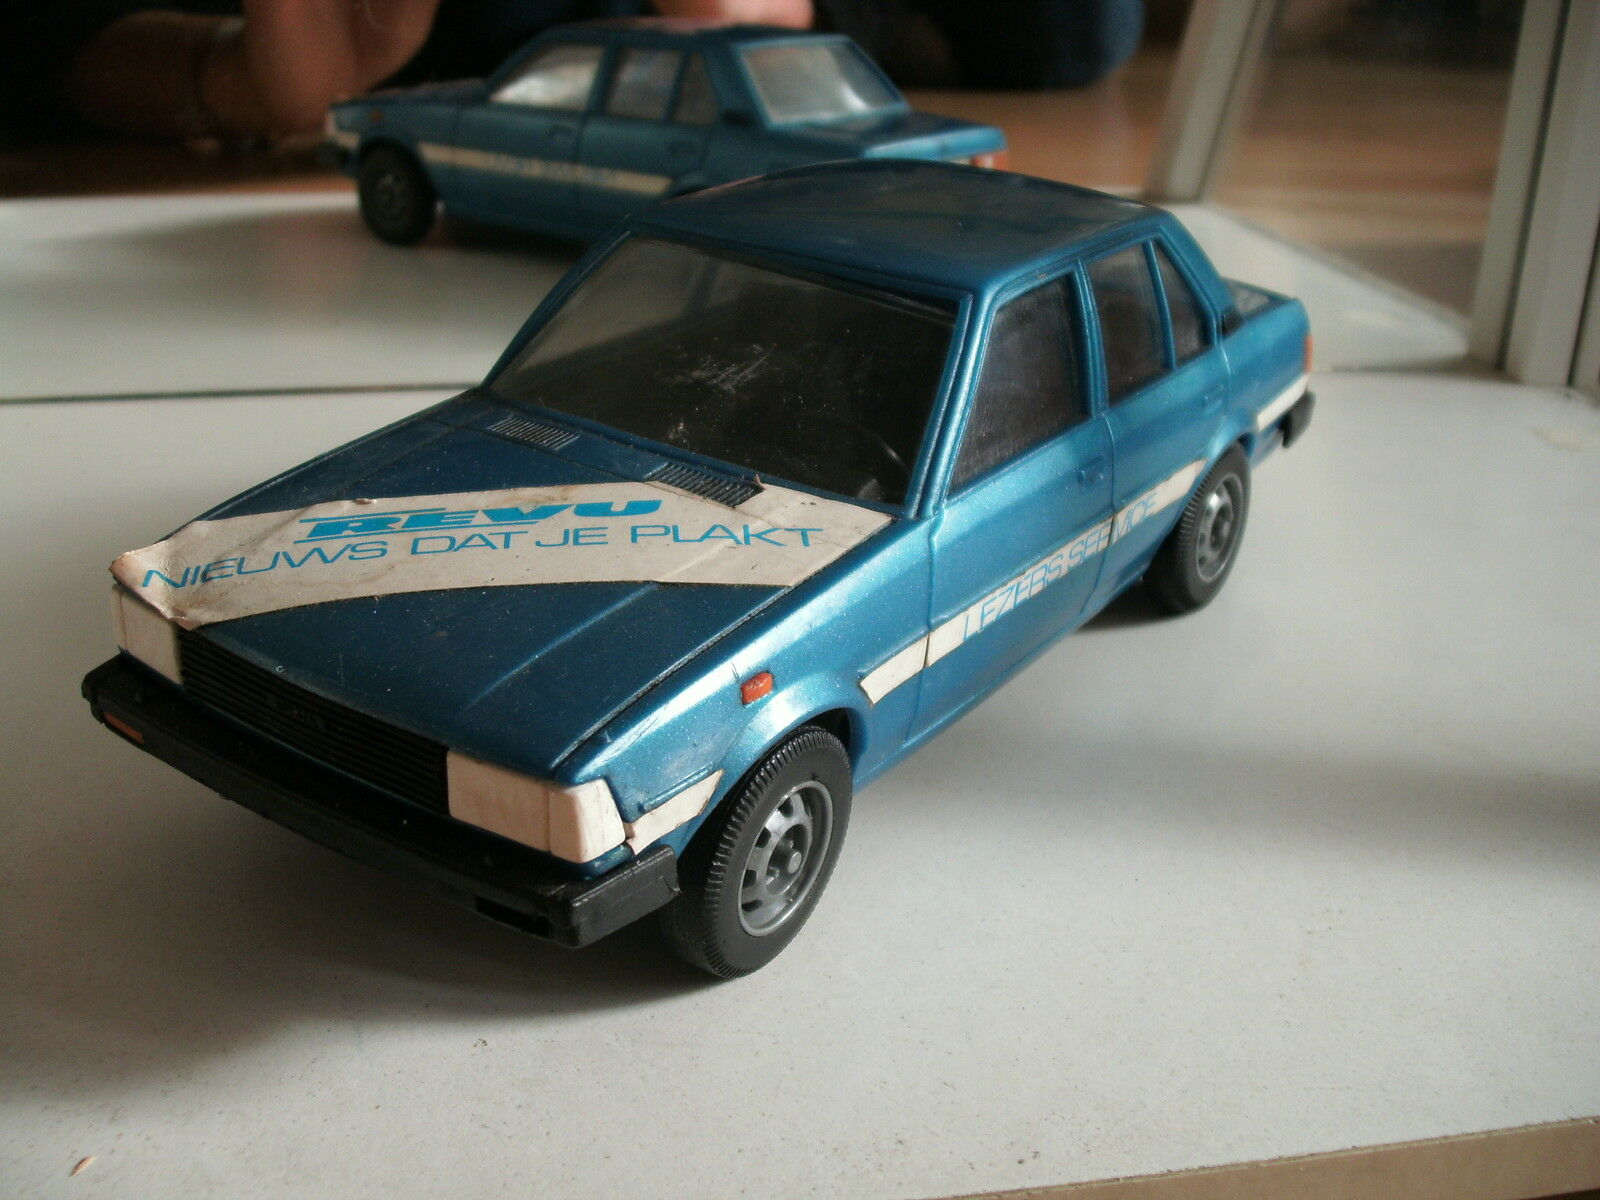 Nyrhinen Toyota Cgoldlla DX  Revu  (Dutch Promo) in bluee on 1 20